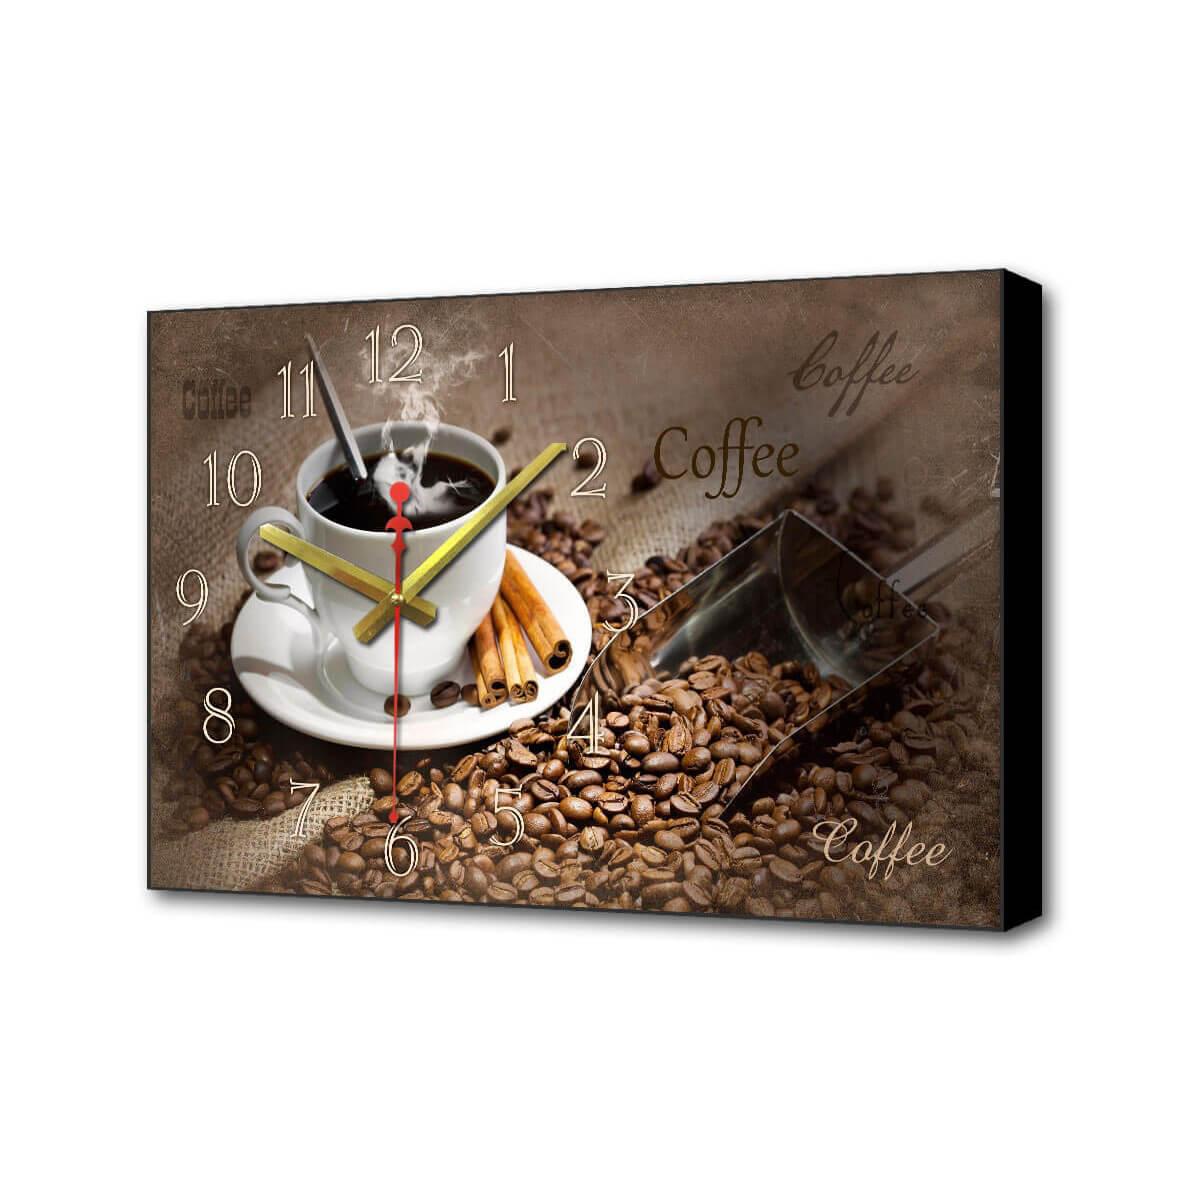 Настенные часы Черный кофе Timebox Toplight 37х60х4см TL-C5021 все цены